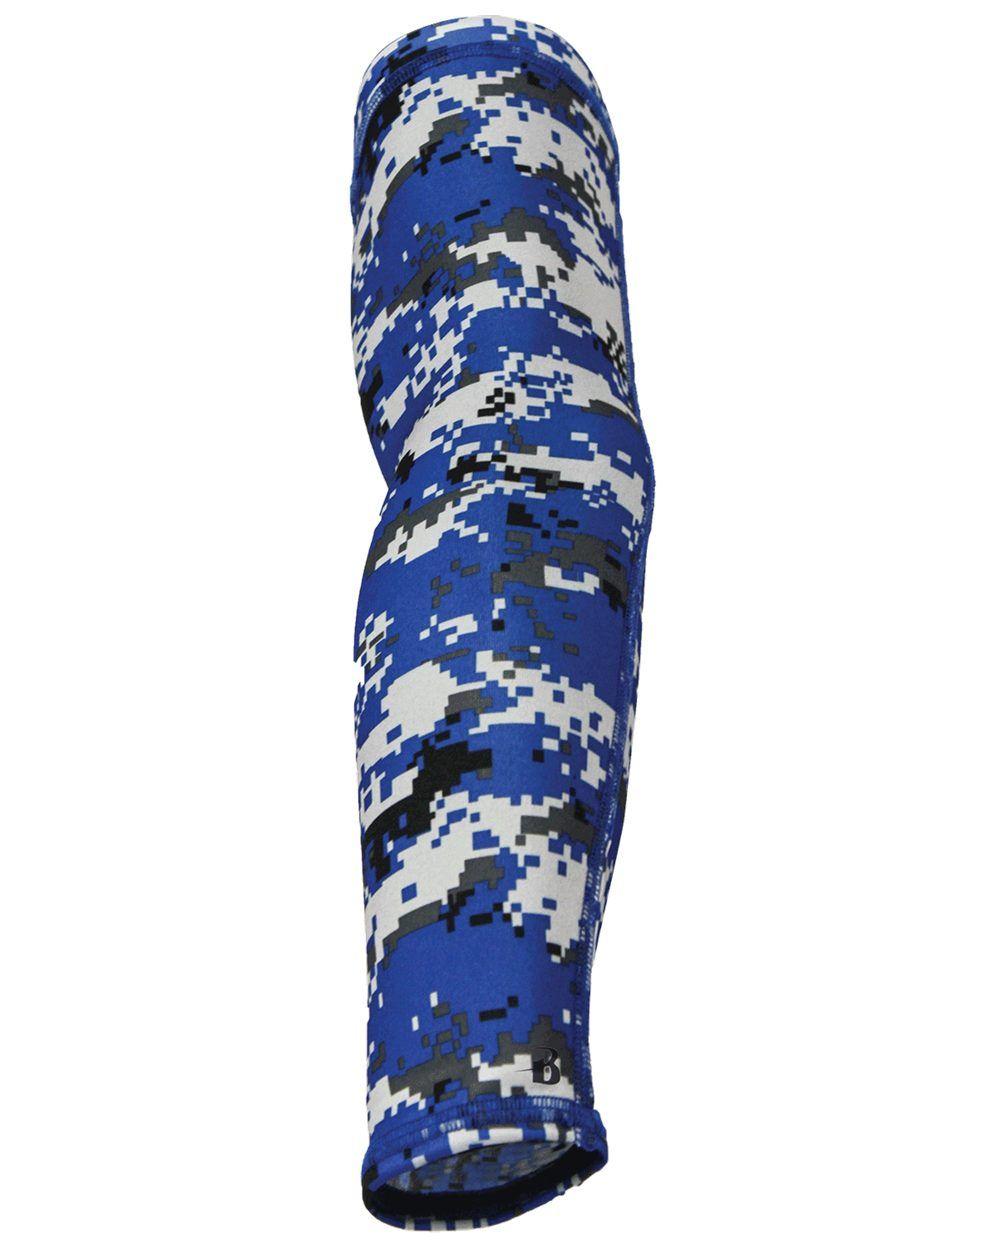 Arm sleeves warmer arm sleeve badger sports basketball